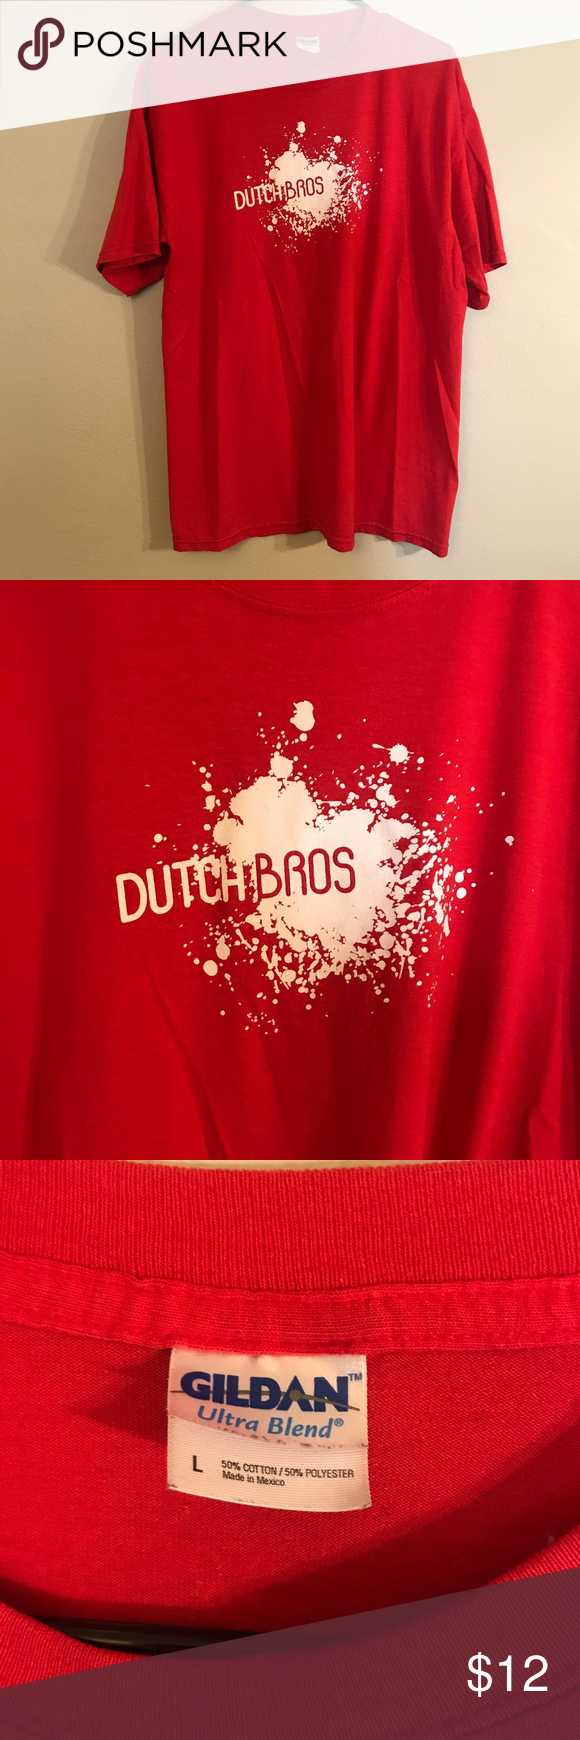 Red Dutch Bros Tee Old school Dutch Bros shirt, great condition. Dutch Bros Tops Tees - Short Sleeve #dutchbros Red Dutch Bros Tee Old school Dutch Bros shirt, great condition. Dutch Bros Tops Tees - Short Sleeve #dutchbros